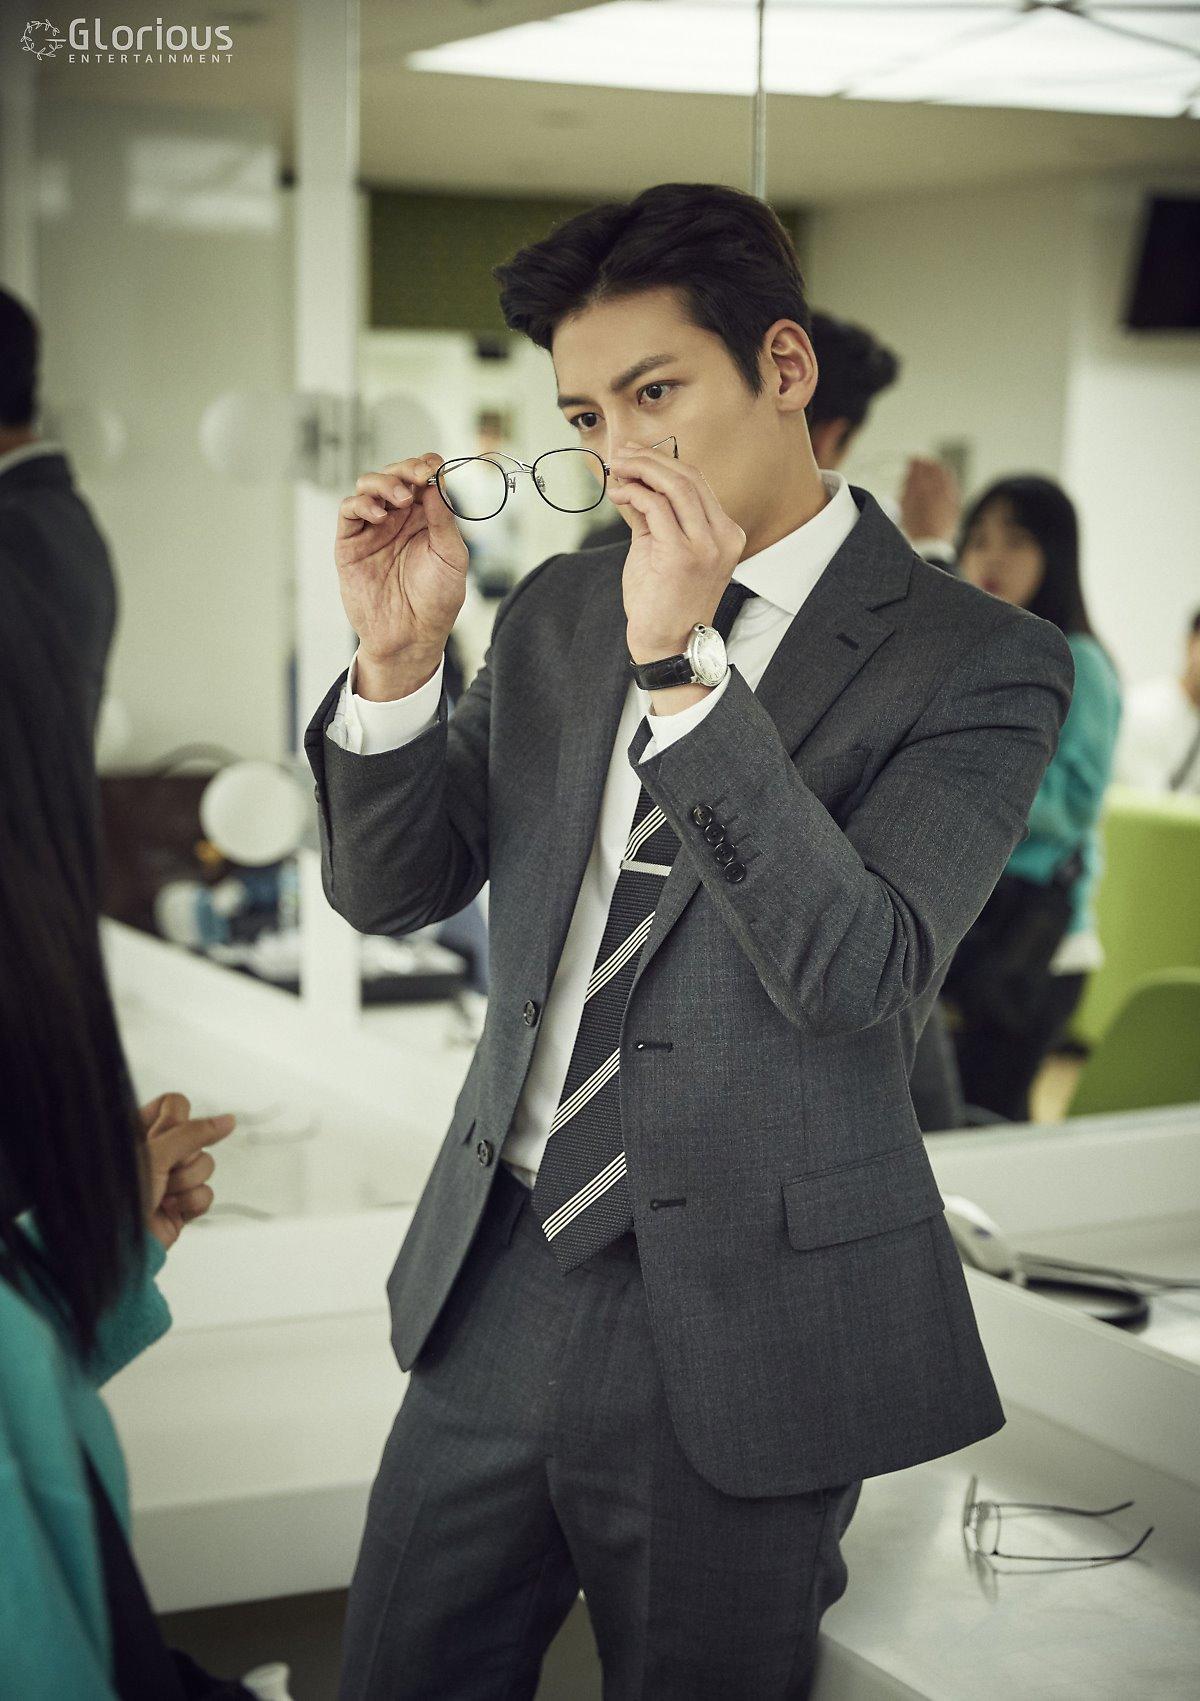 Drama Even more behindscenes photos of Ji Chang Wook in